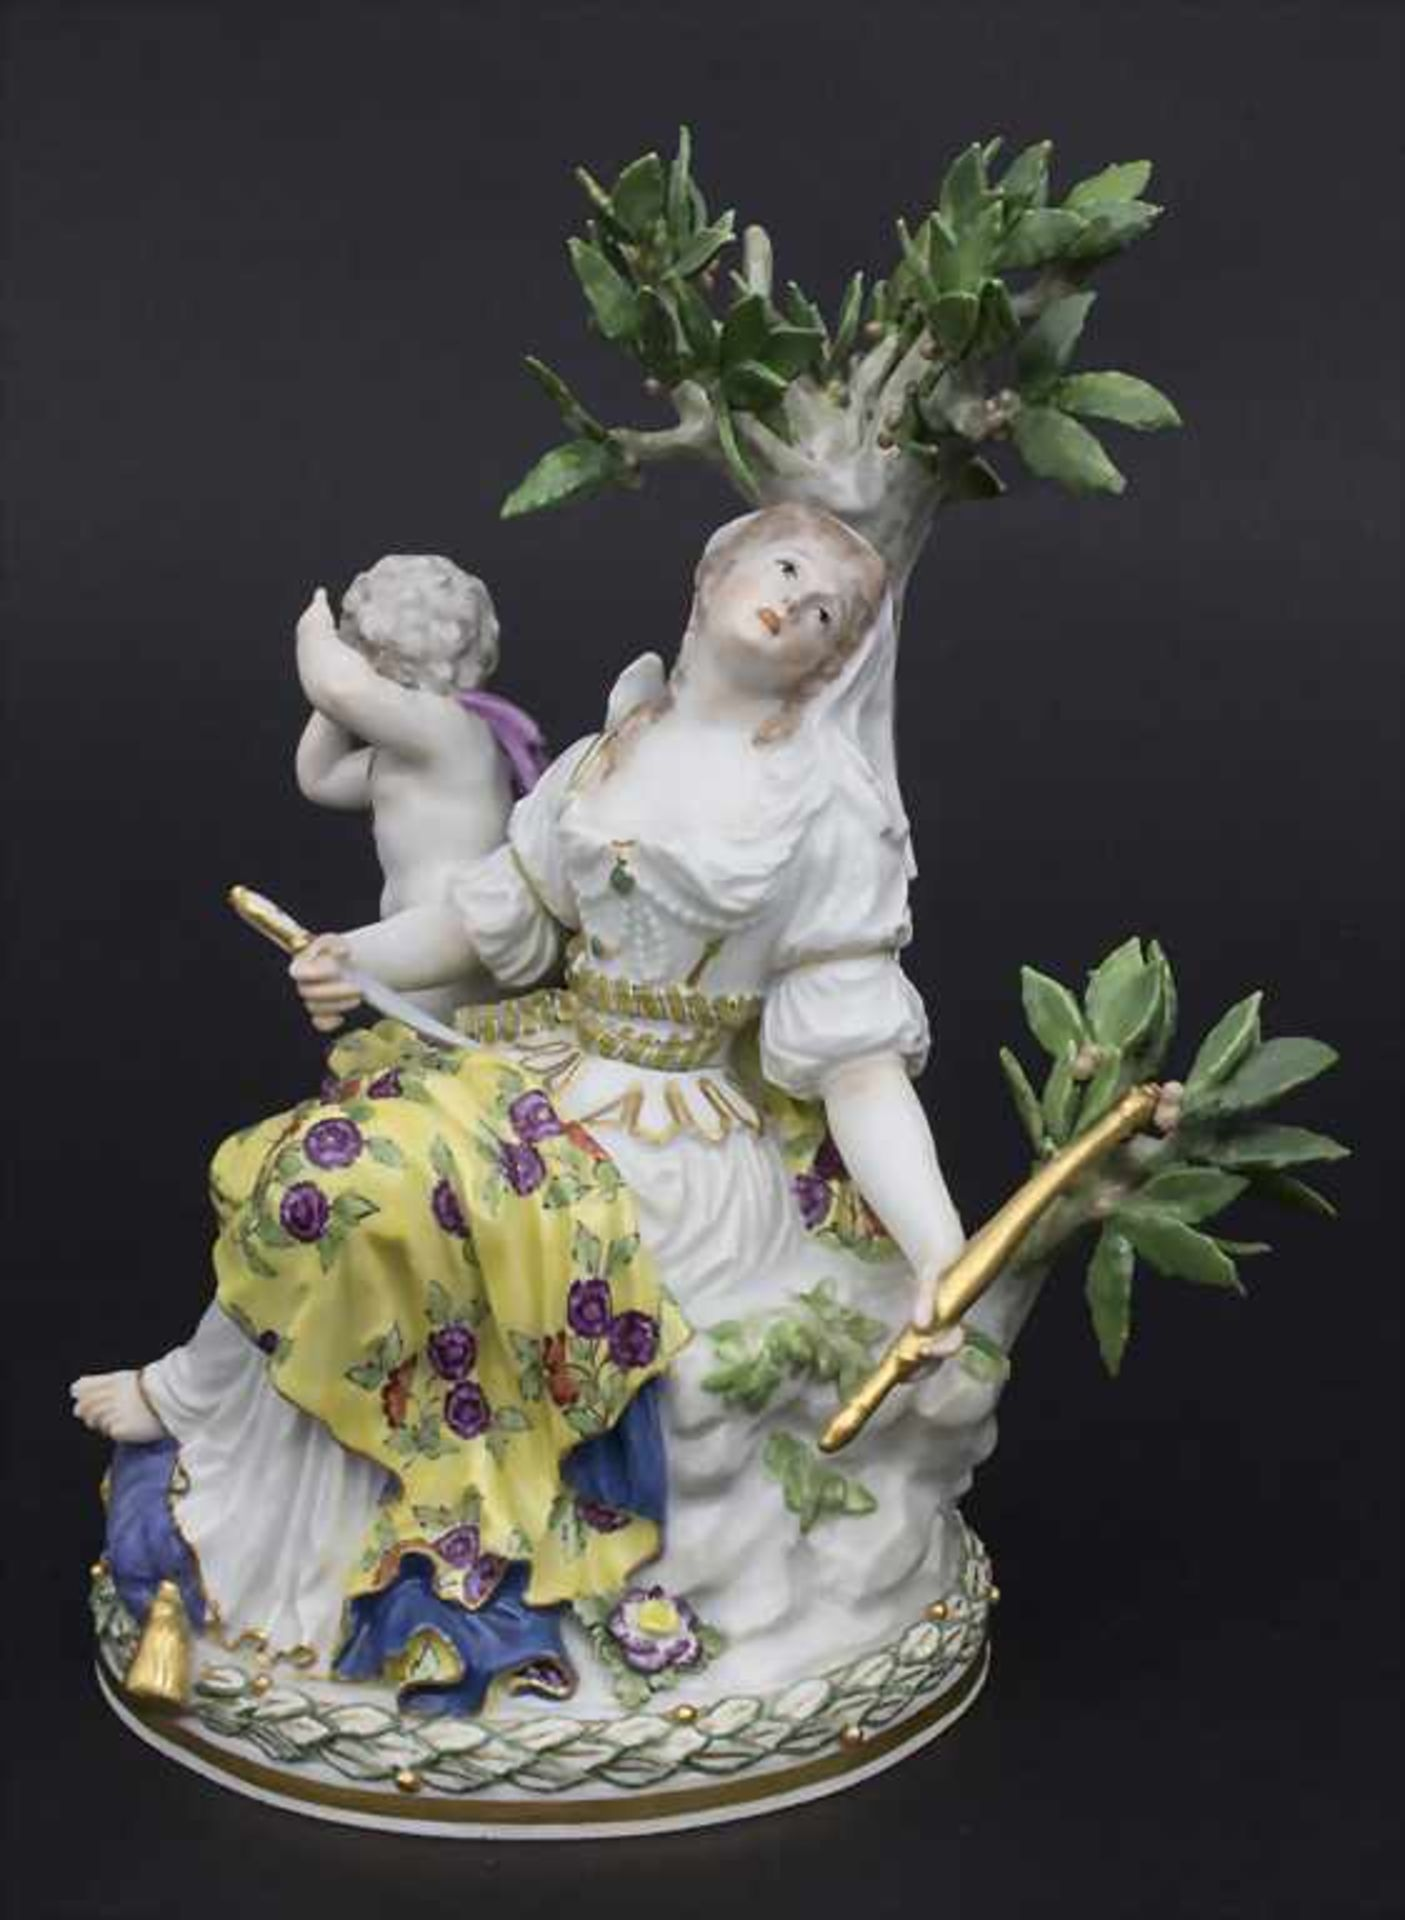 Figurengruppe 'Melpomene mit Putto' / A figural group 'Melpomene with cupid', Meissen, 19. Jh.